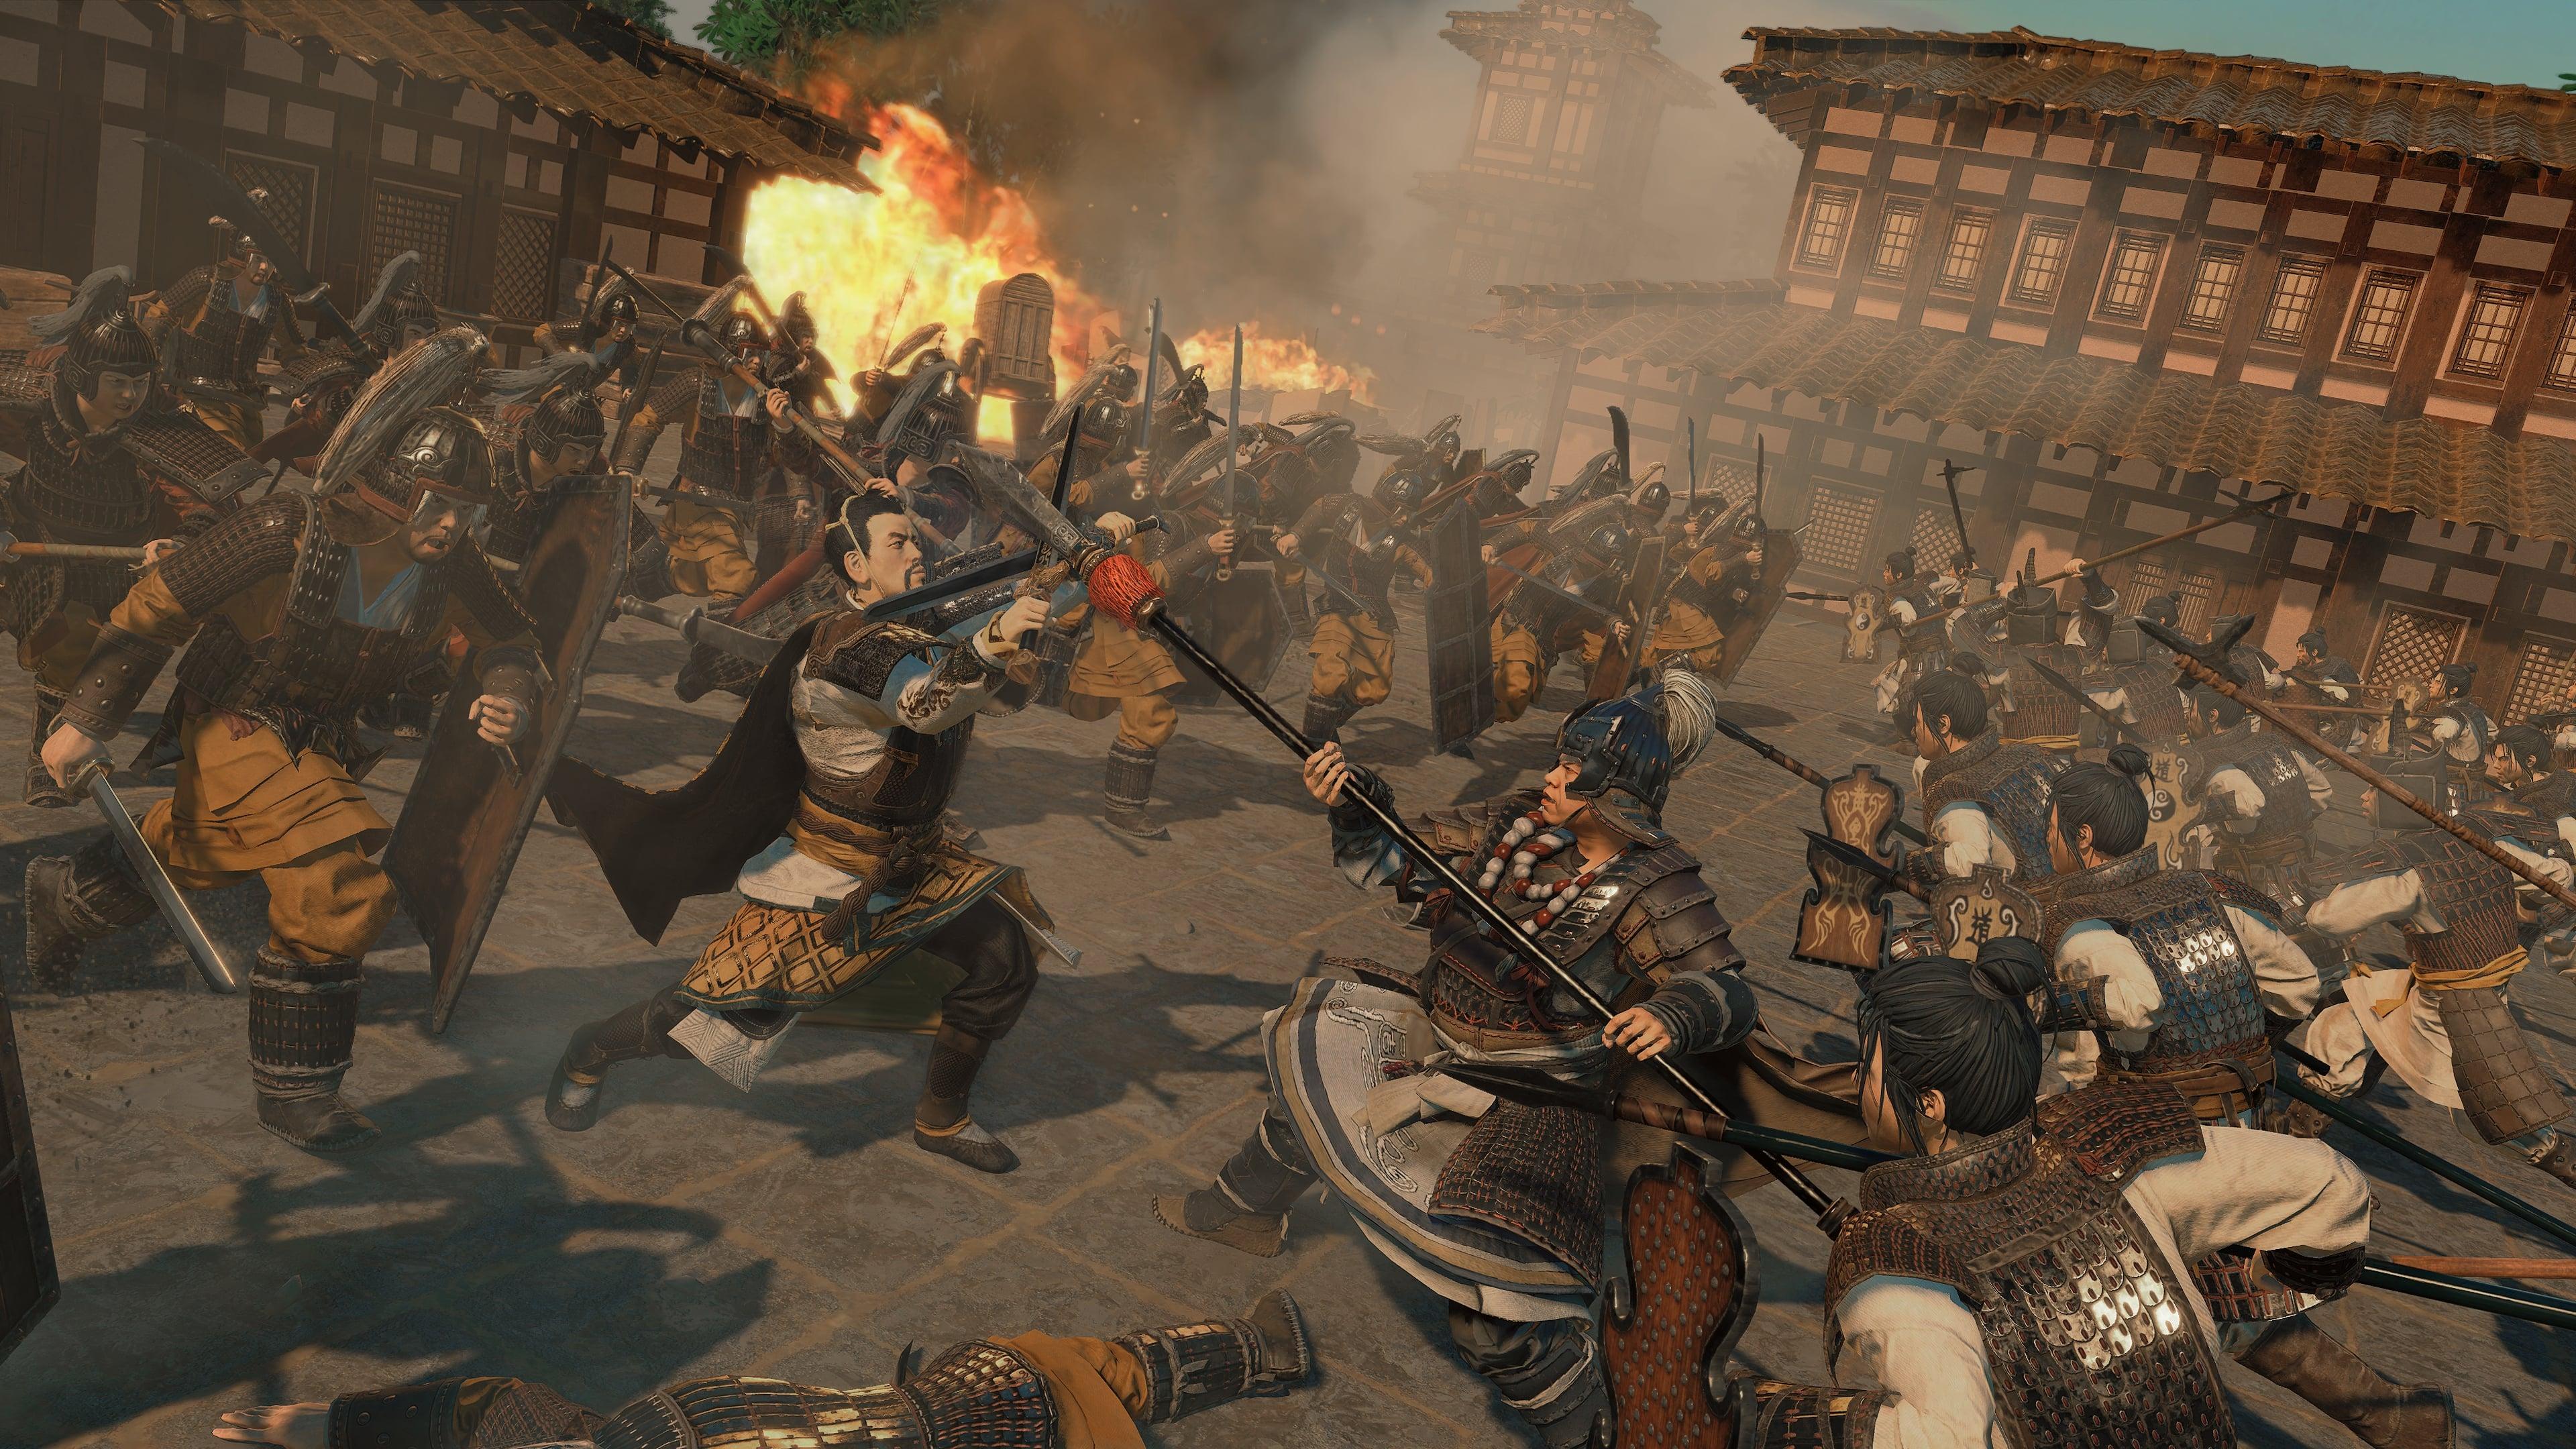 Трейлер, скриншоты и дата выхода дополнения Mandate of Heaven для Total War: Three Kingdoms